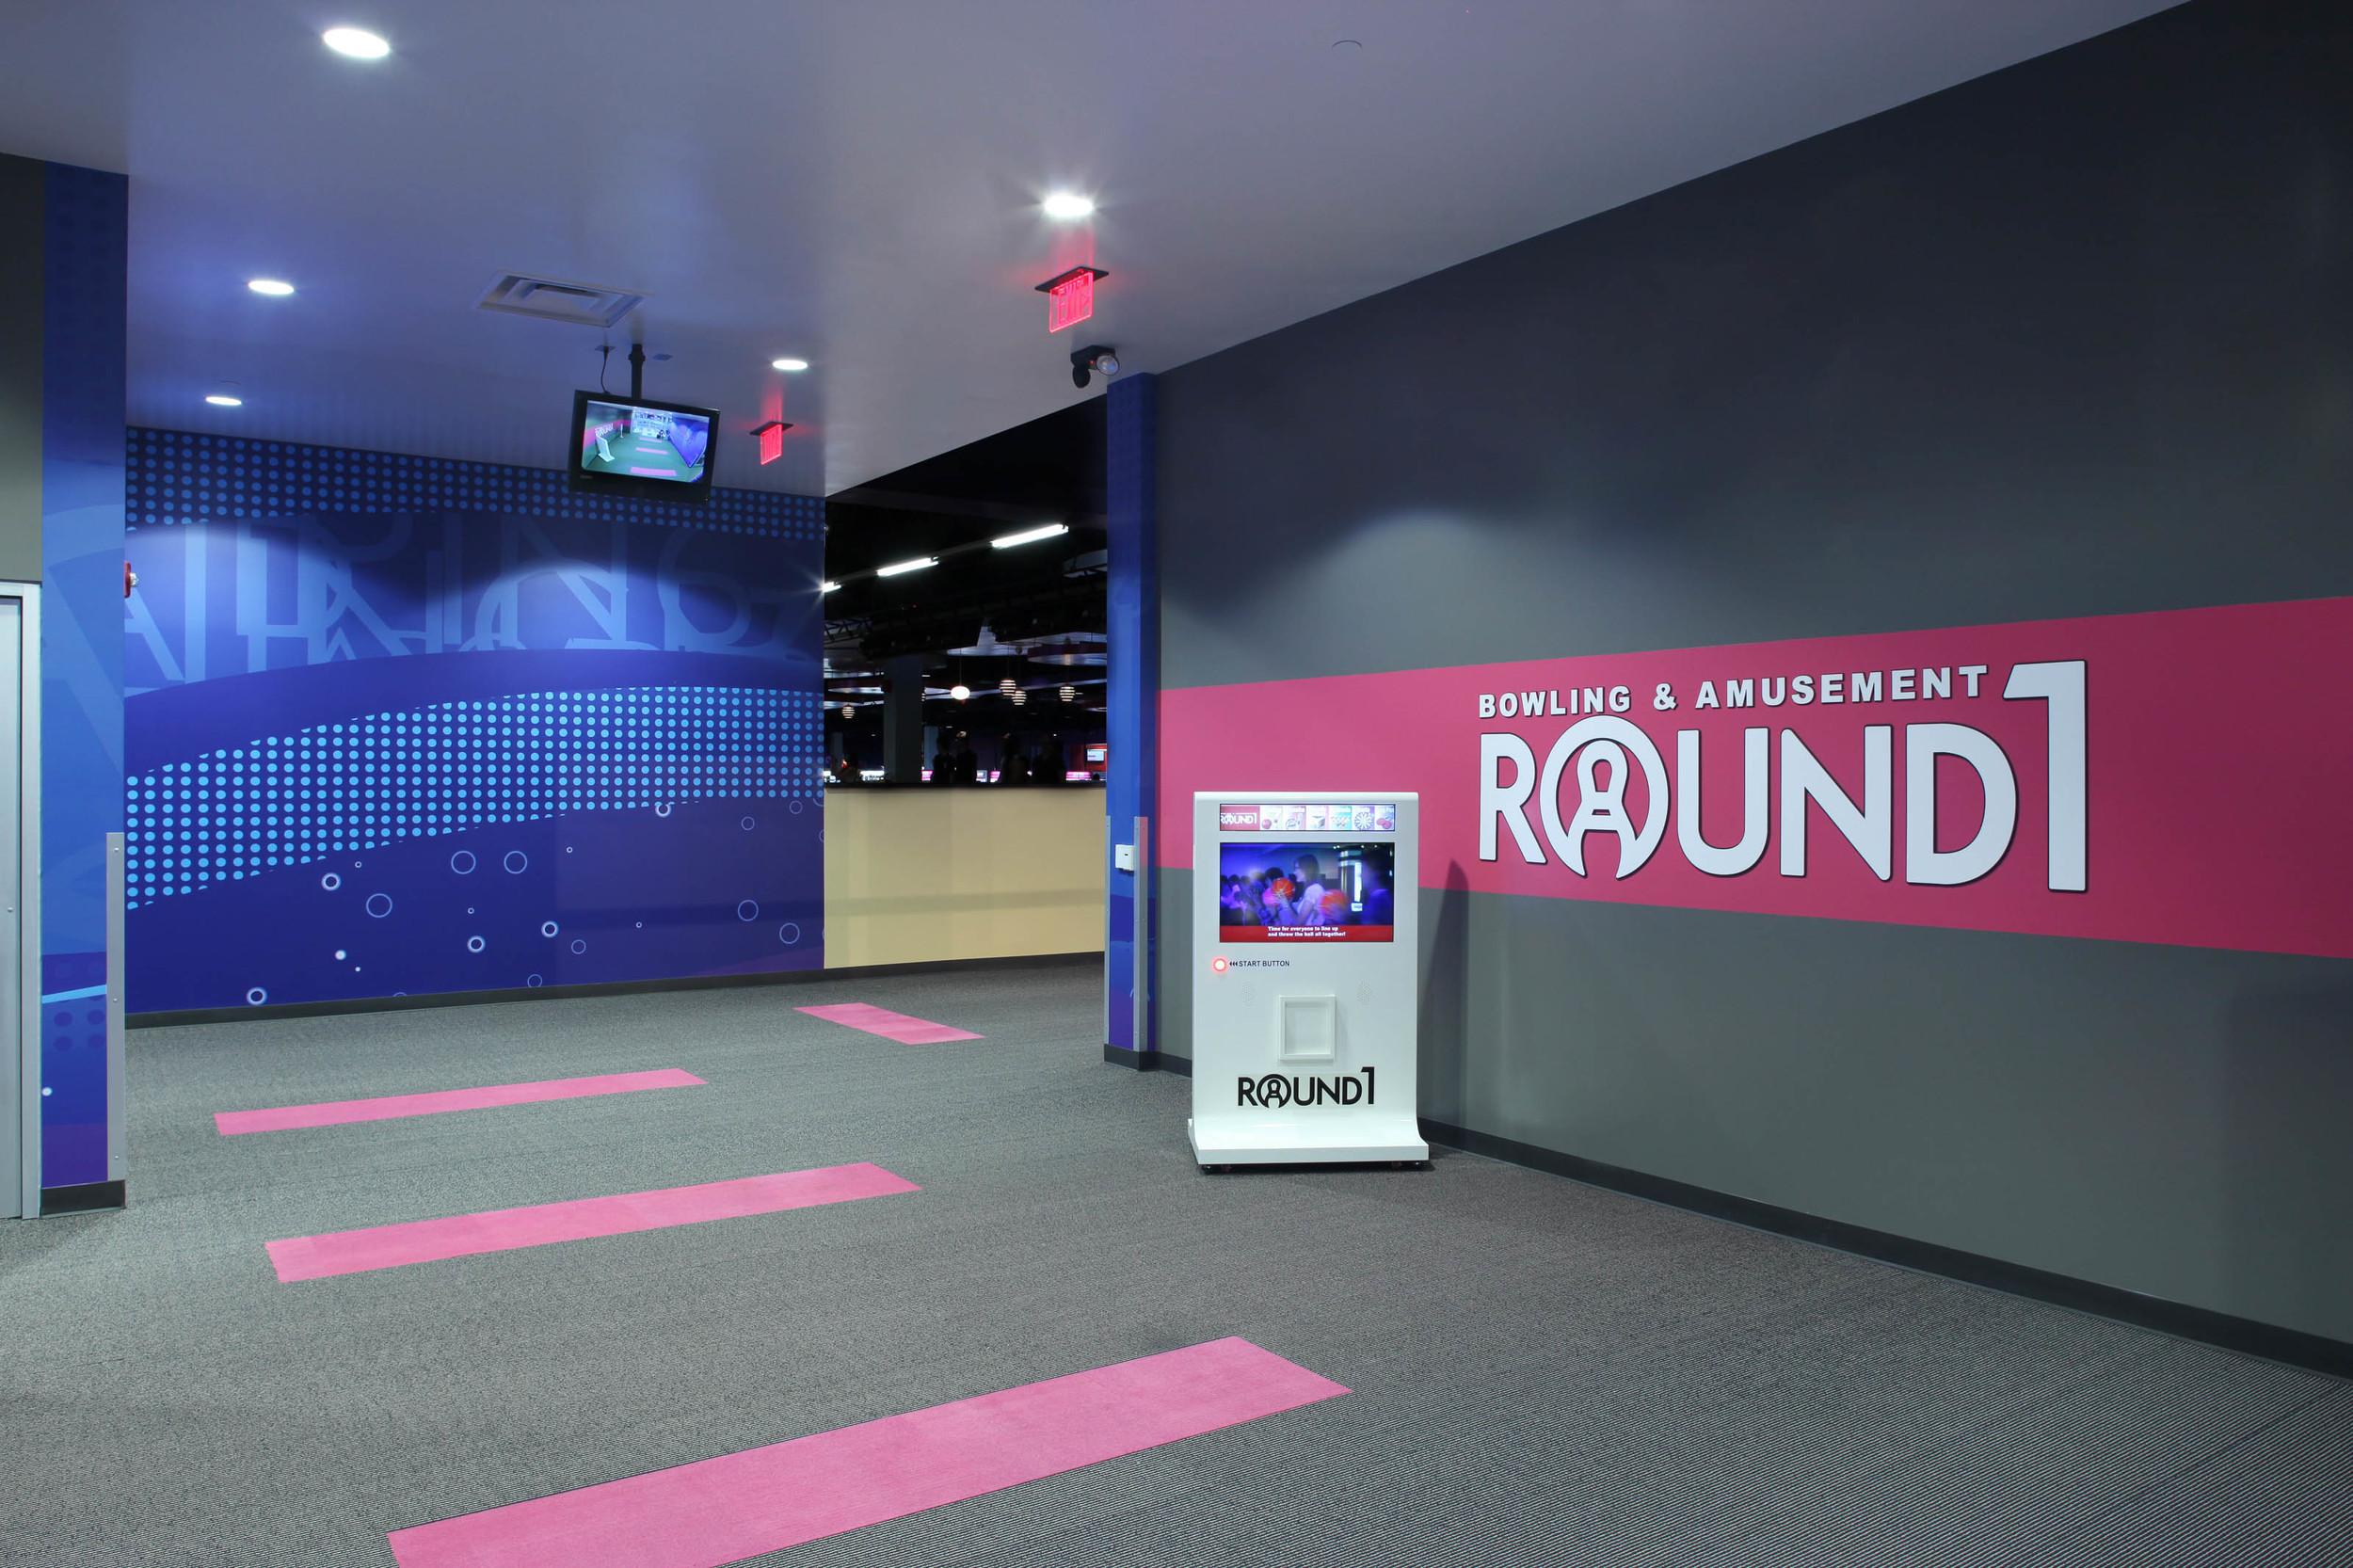 Round1 Bowling & Amusement Entrance